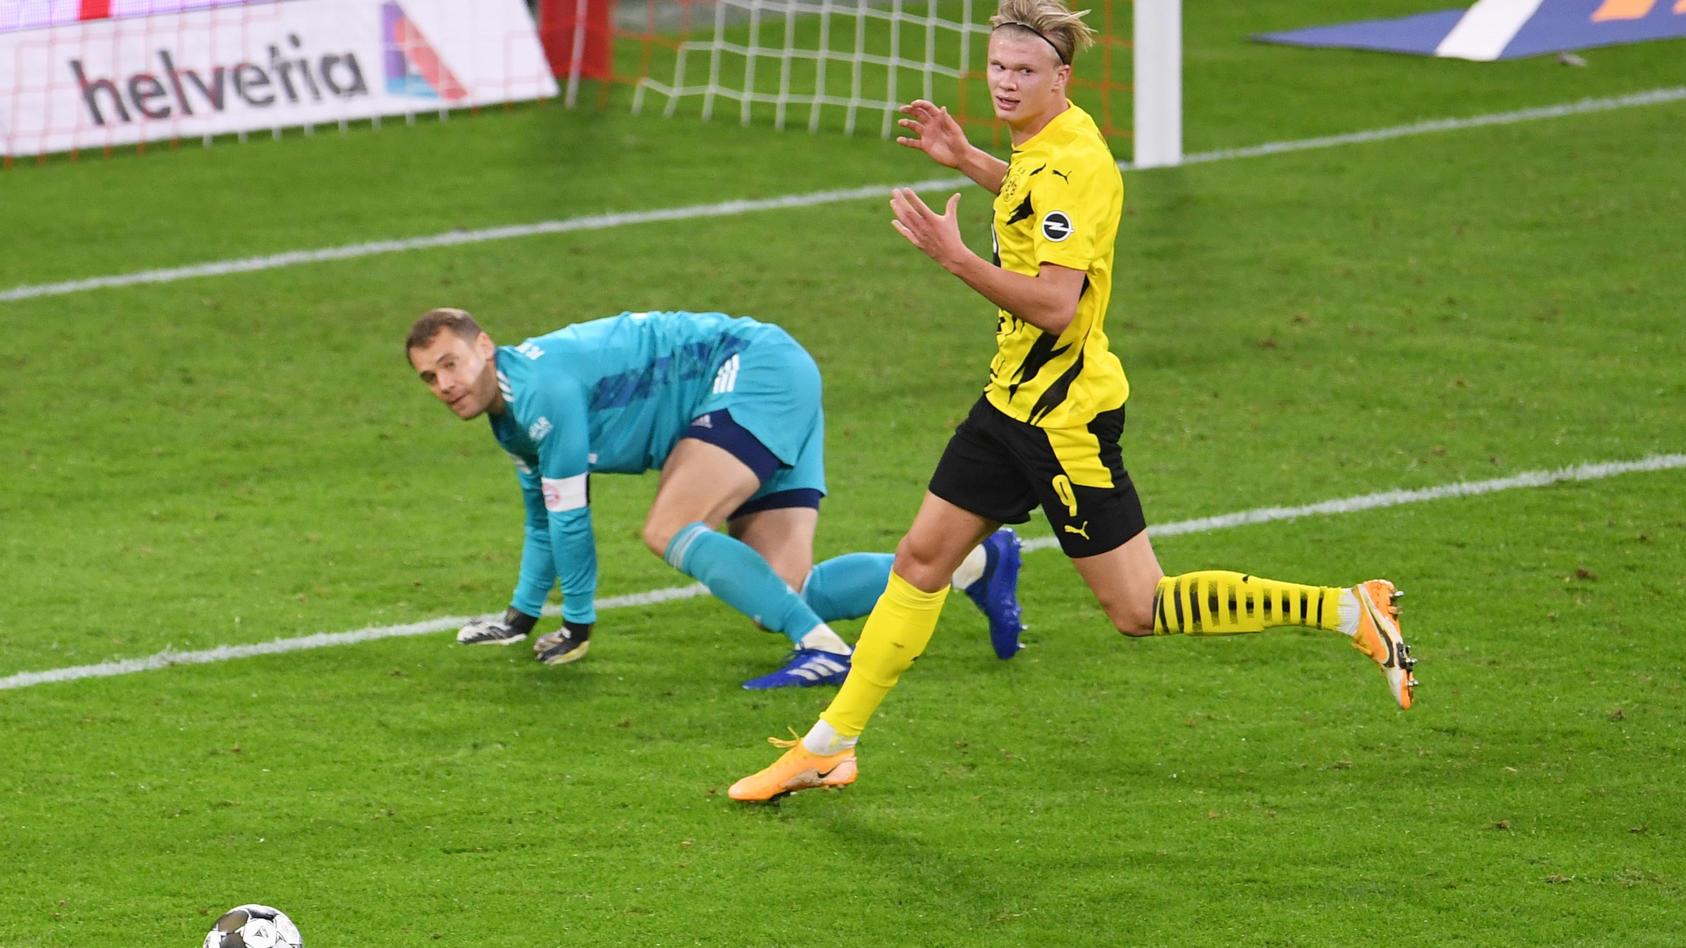 DFL-Supercup - Bayern Munich v Borussia Dortmund